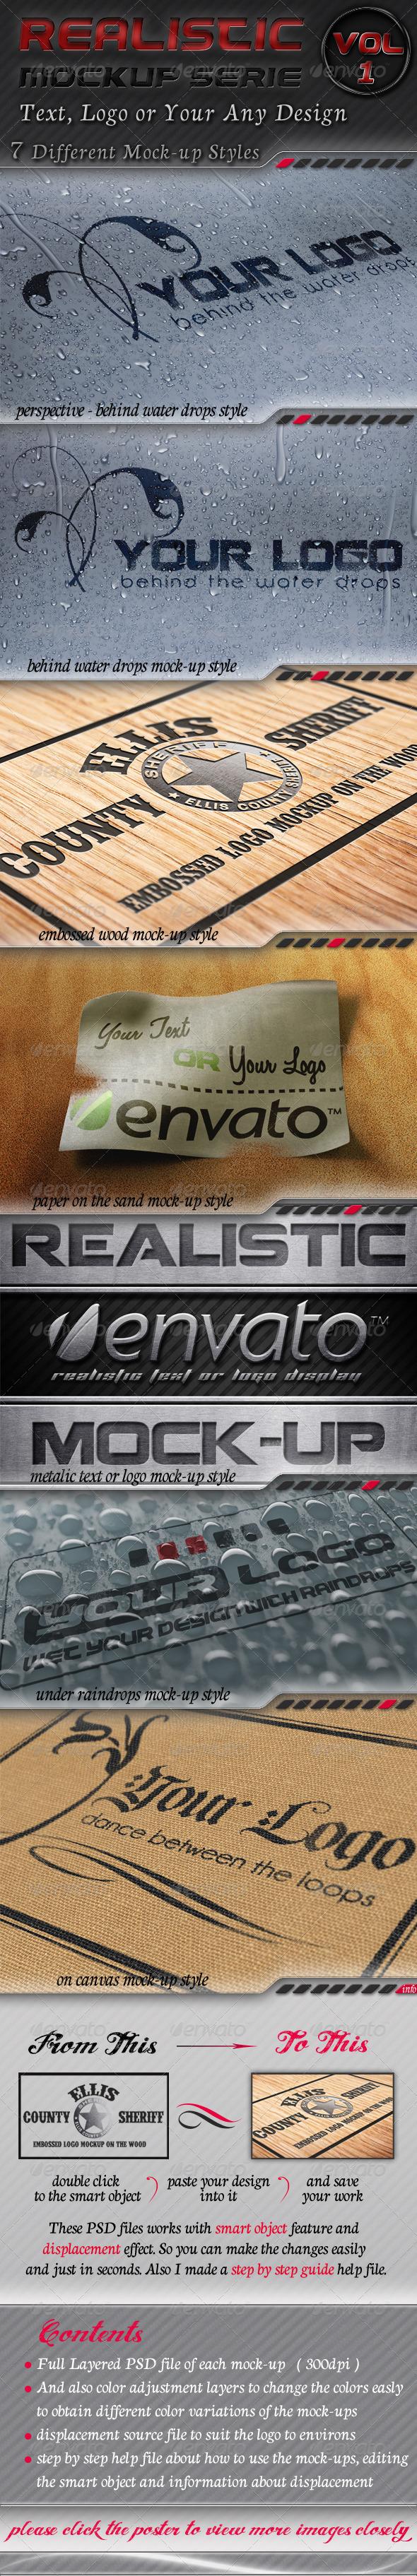 7 Logo Mockups Serie 1 - Realistic Display - Logo Product Mock-Ups